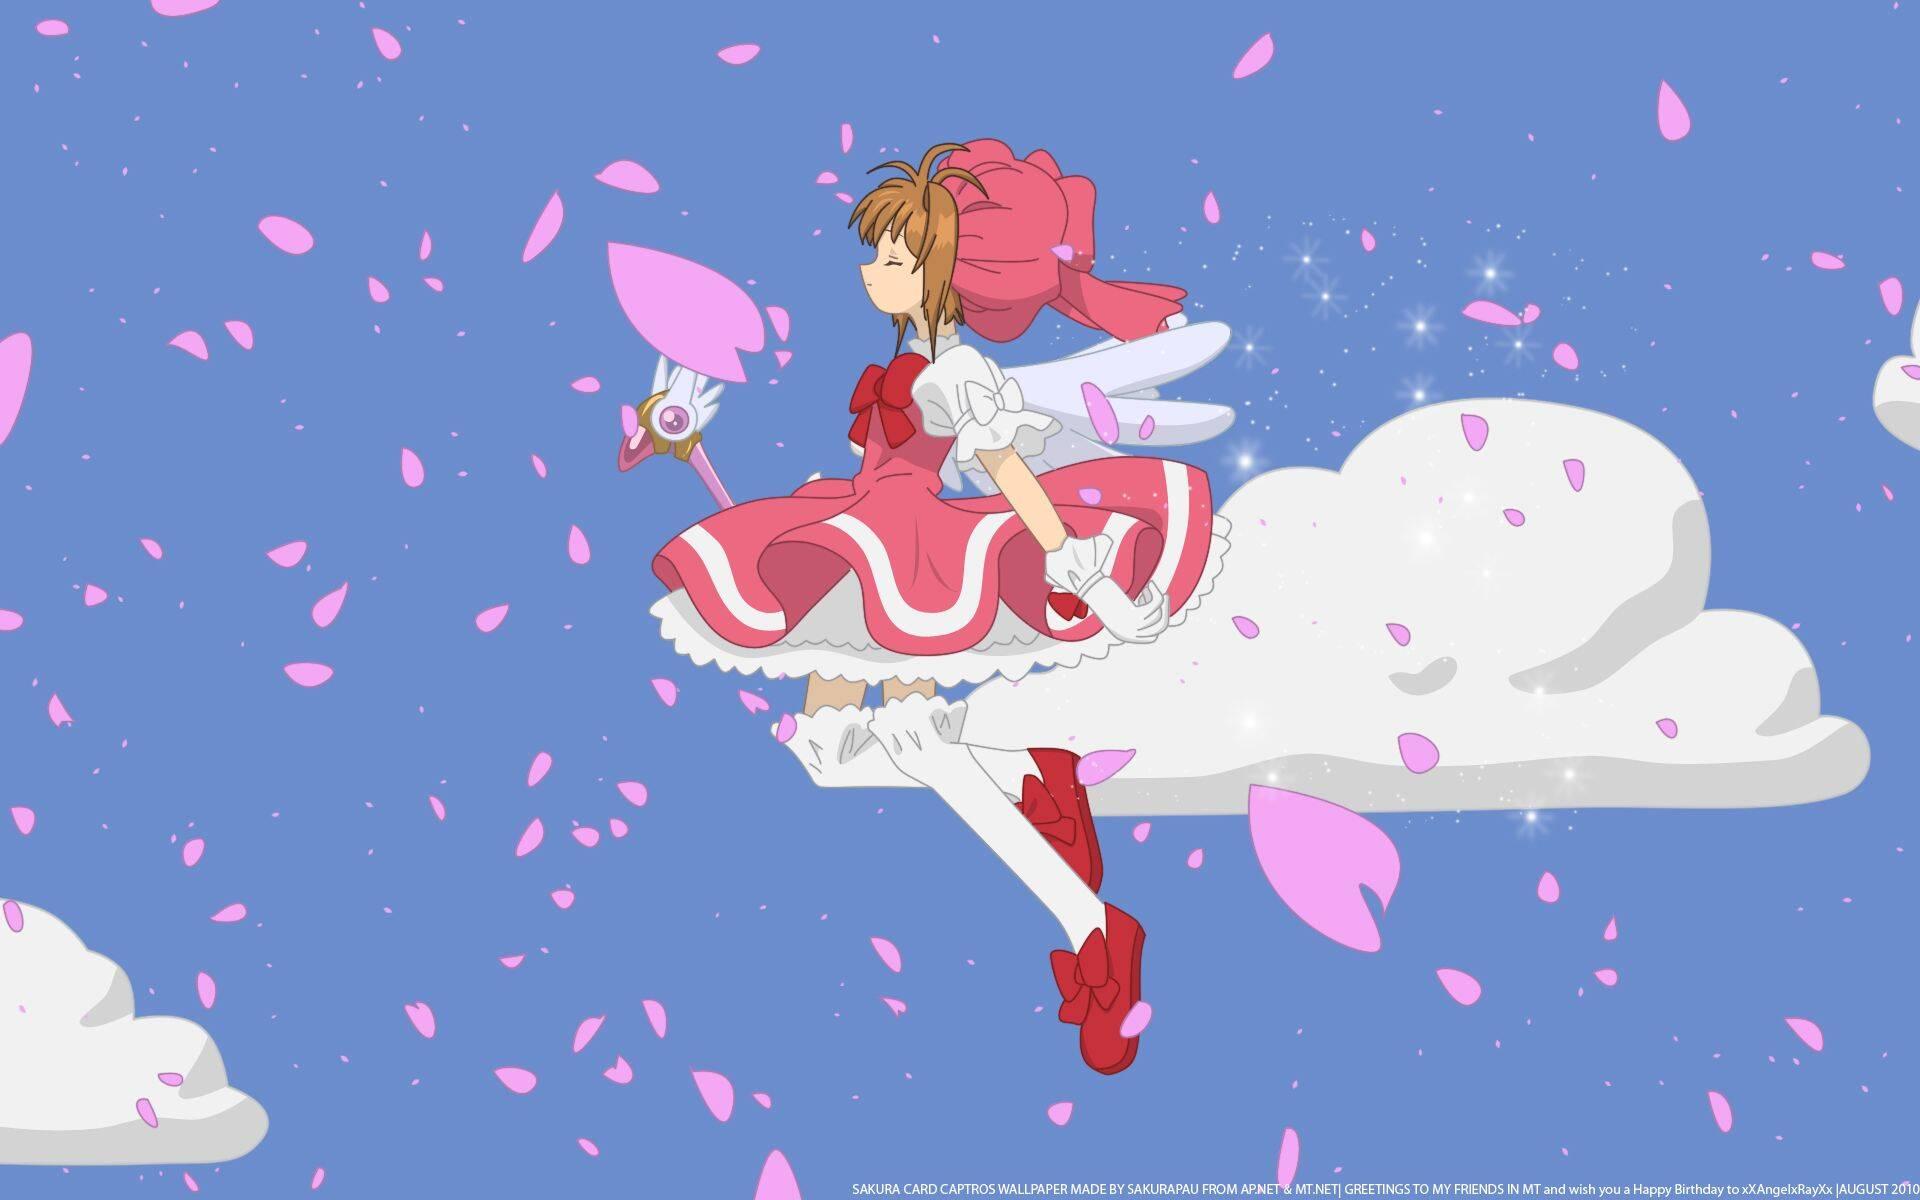 Sakura Card Captors (Foto: Reprodução/ Pinterest)